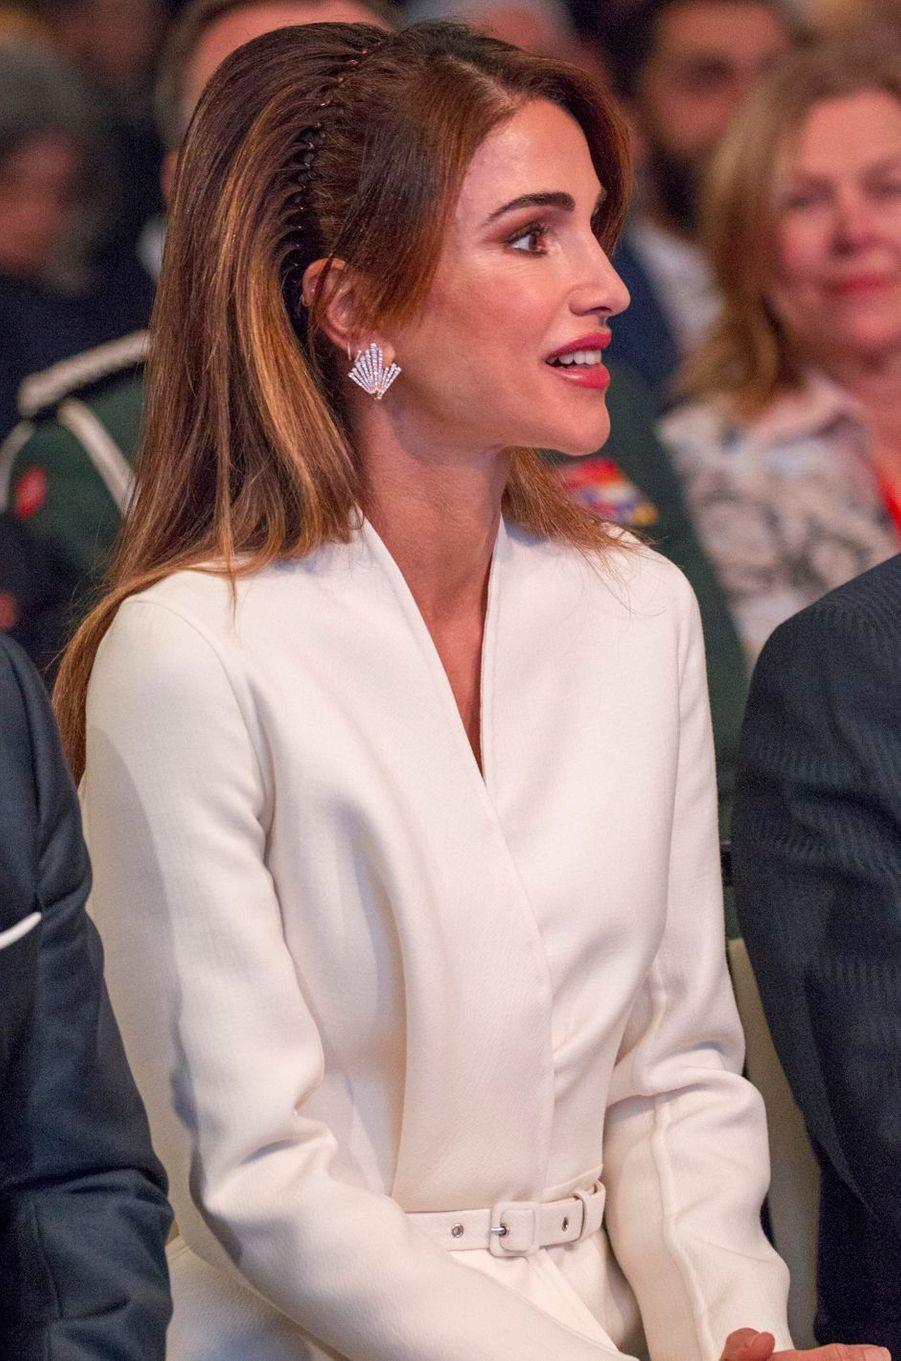 La coiffure de la reine Rania de Jordanie à Amman, le 2 mars 2020